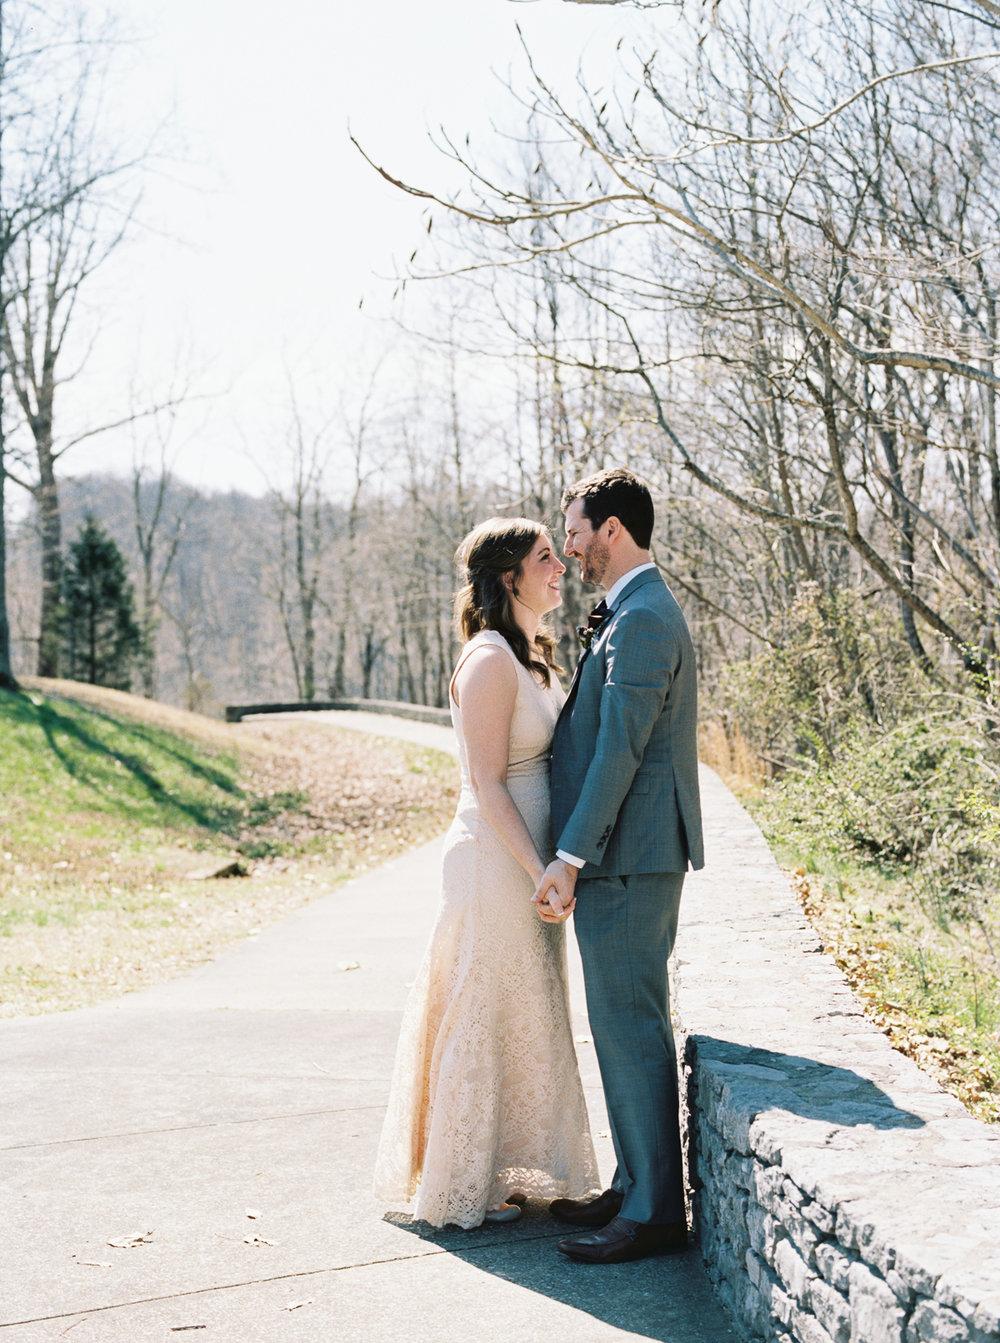 laurel+kelly_natchez_trace_grays_on_main_franklin_film_wedding_photographers©2017abigailbobophotography-1-3.jpg